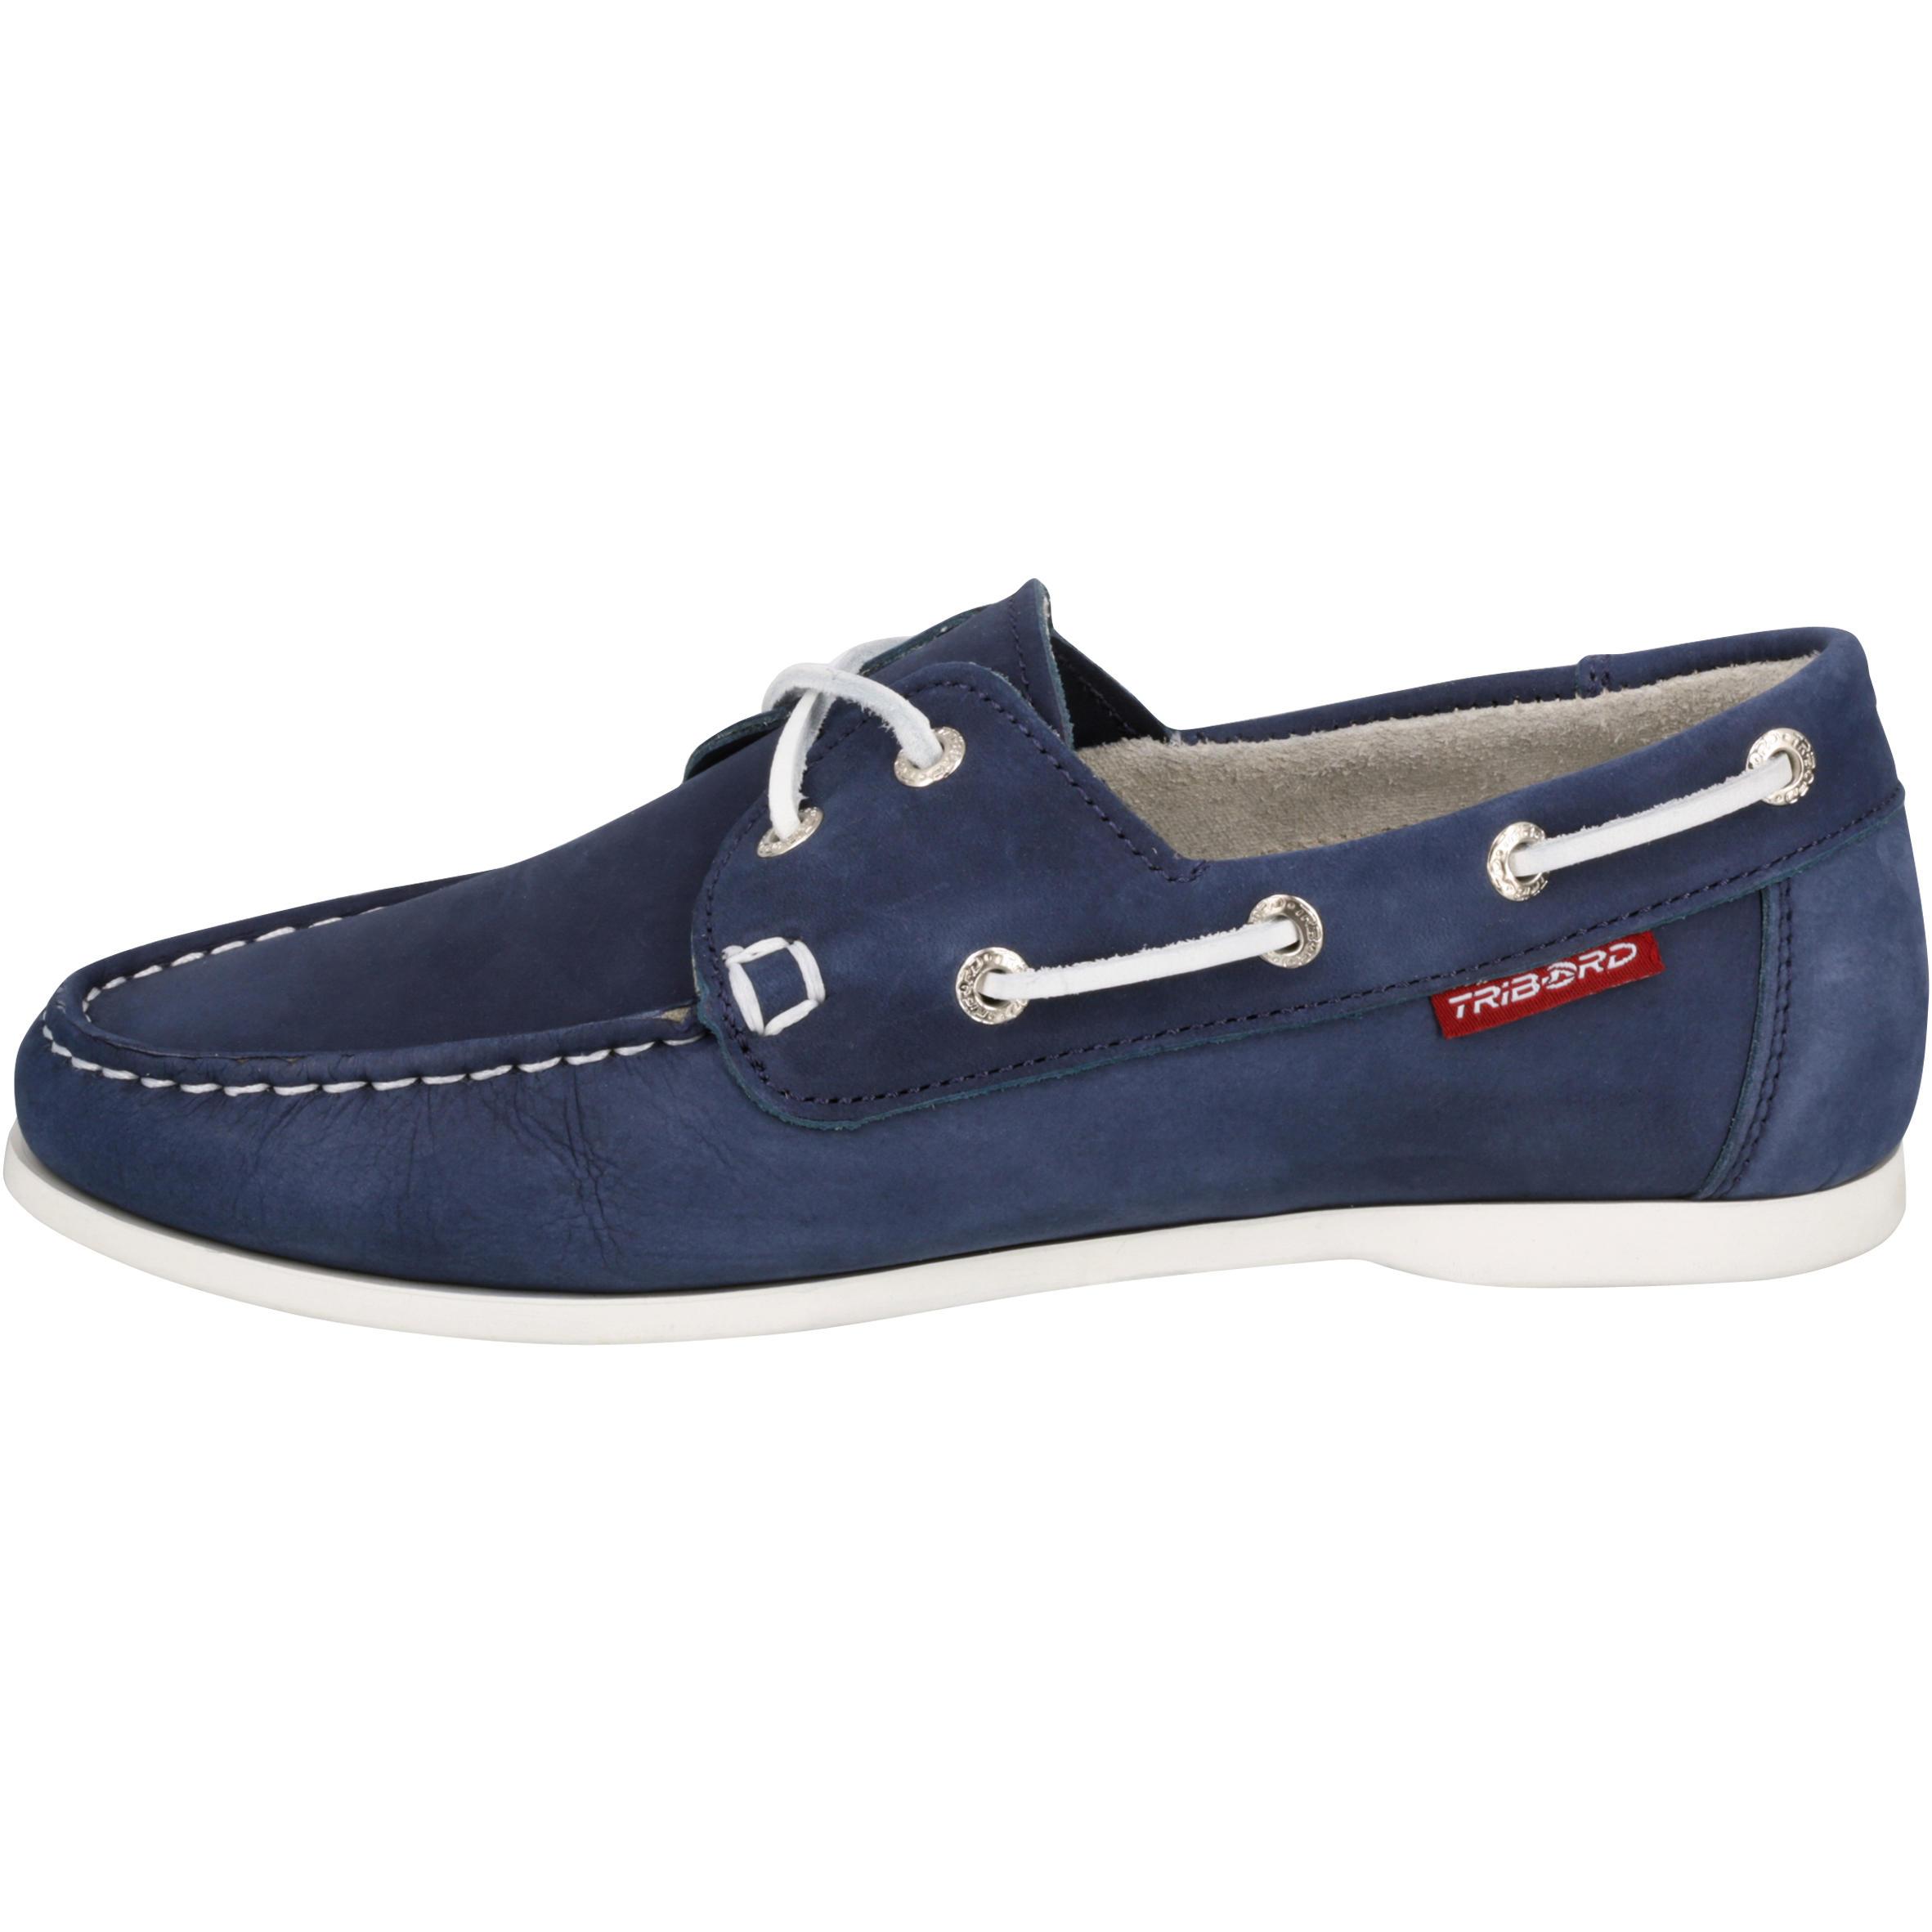 Navy Cruise Women's Leather 500 Shoes Blue Boat u3TJ51lFKc